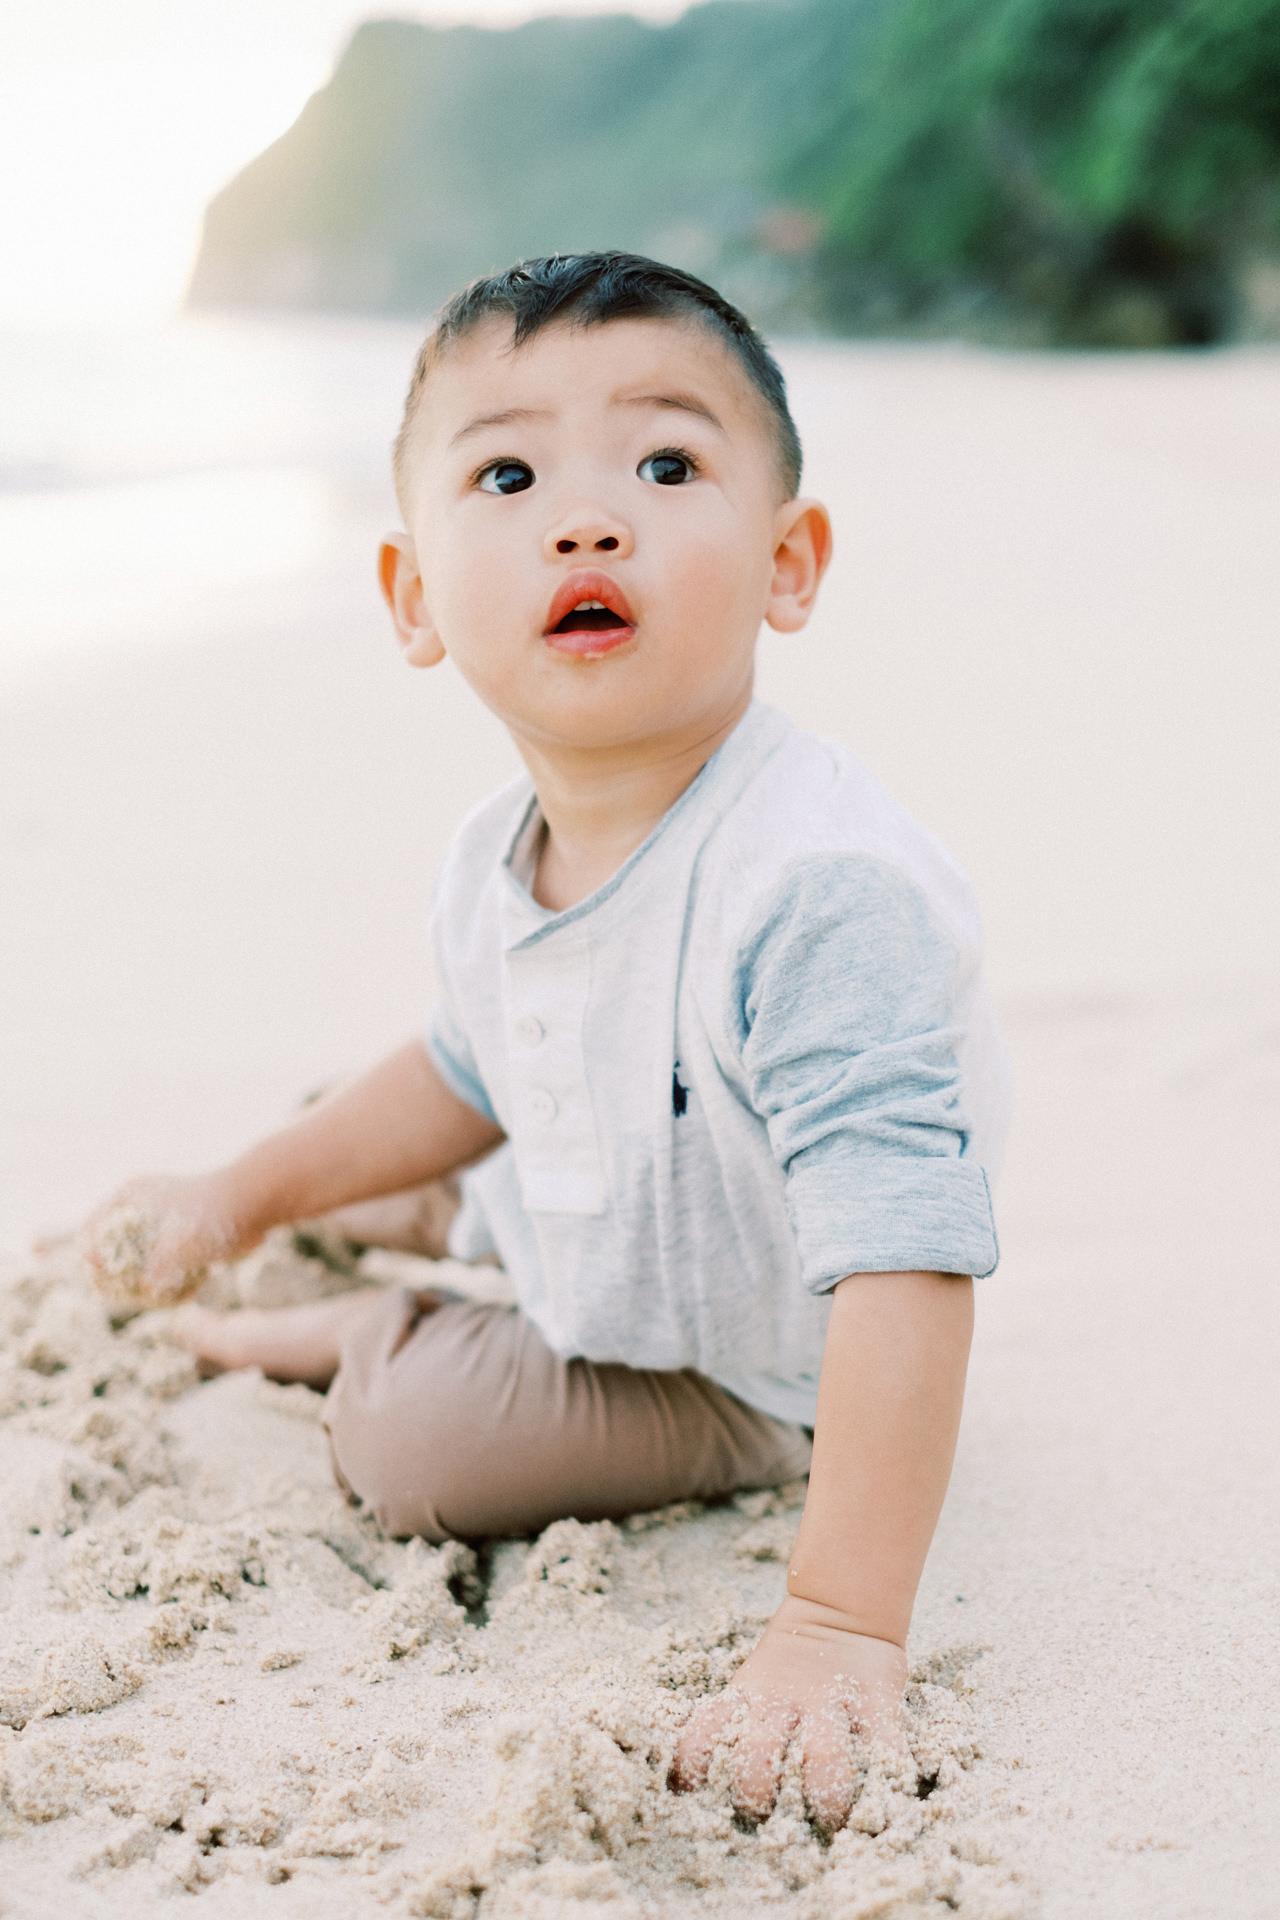 H&M: Bali Family Photo Session 11